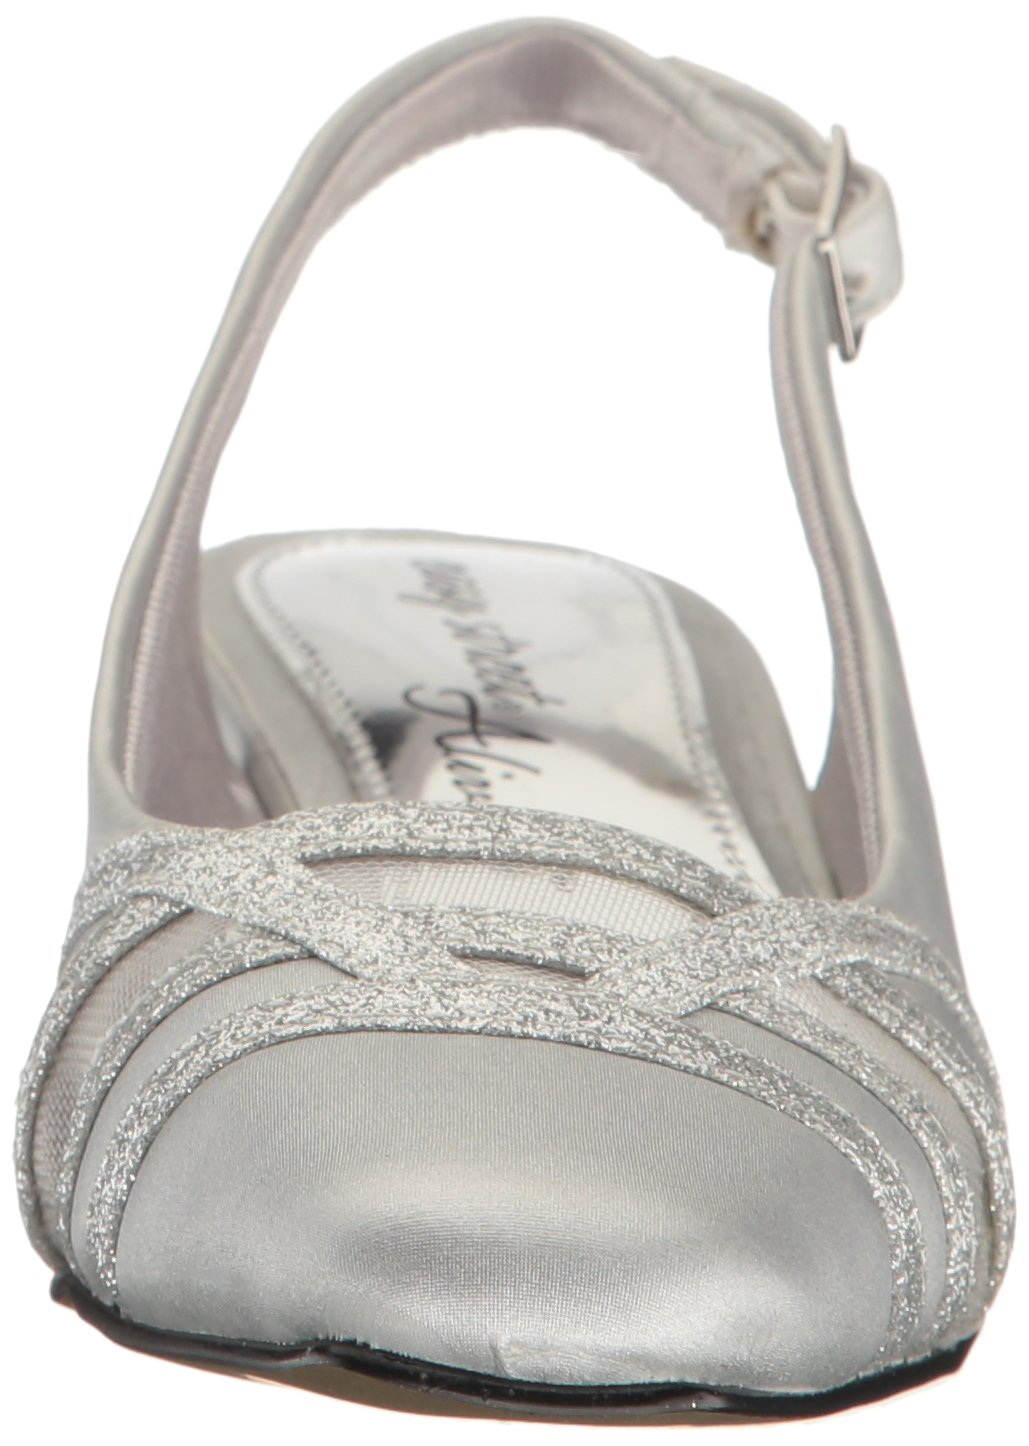 Easy Street Women's Kristen Dress Pump B01MXRP5NN 12 W US|Silver Satin/Silver